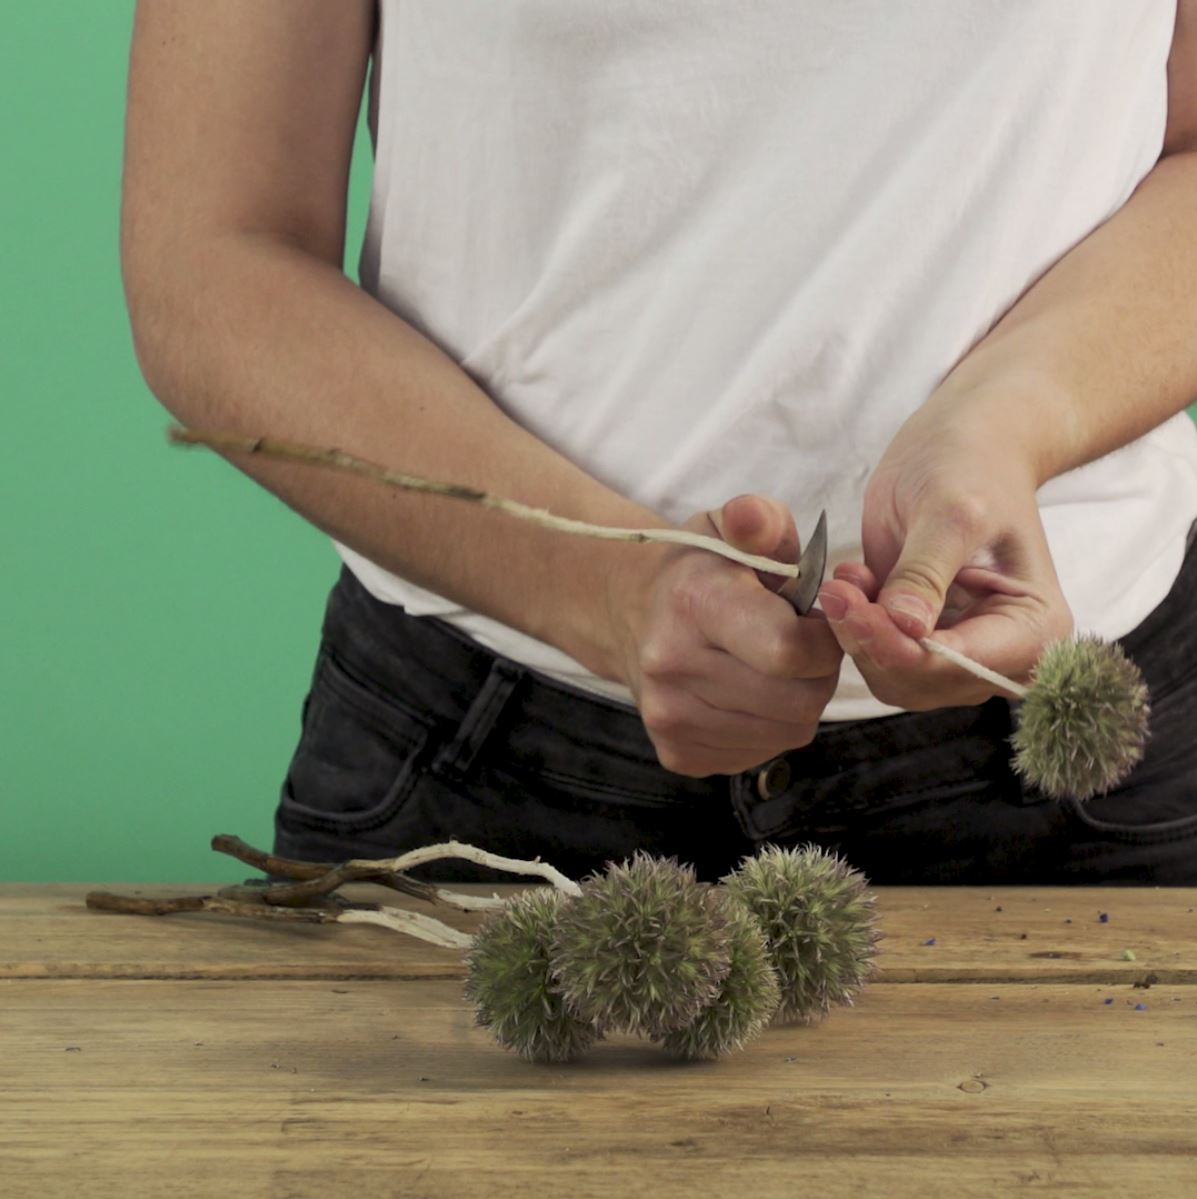 DIY Hortensiakrans stap 2: Distels snijden